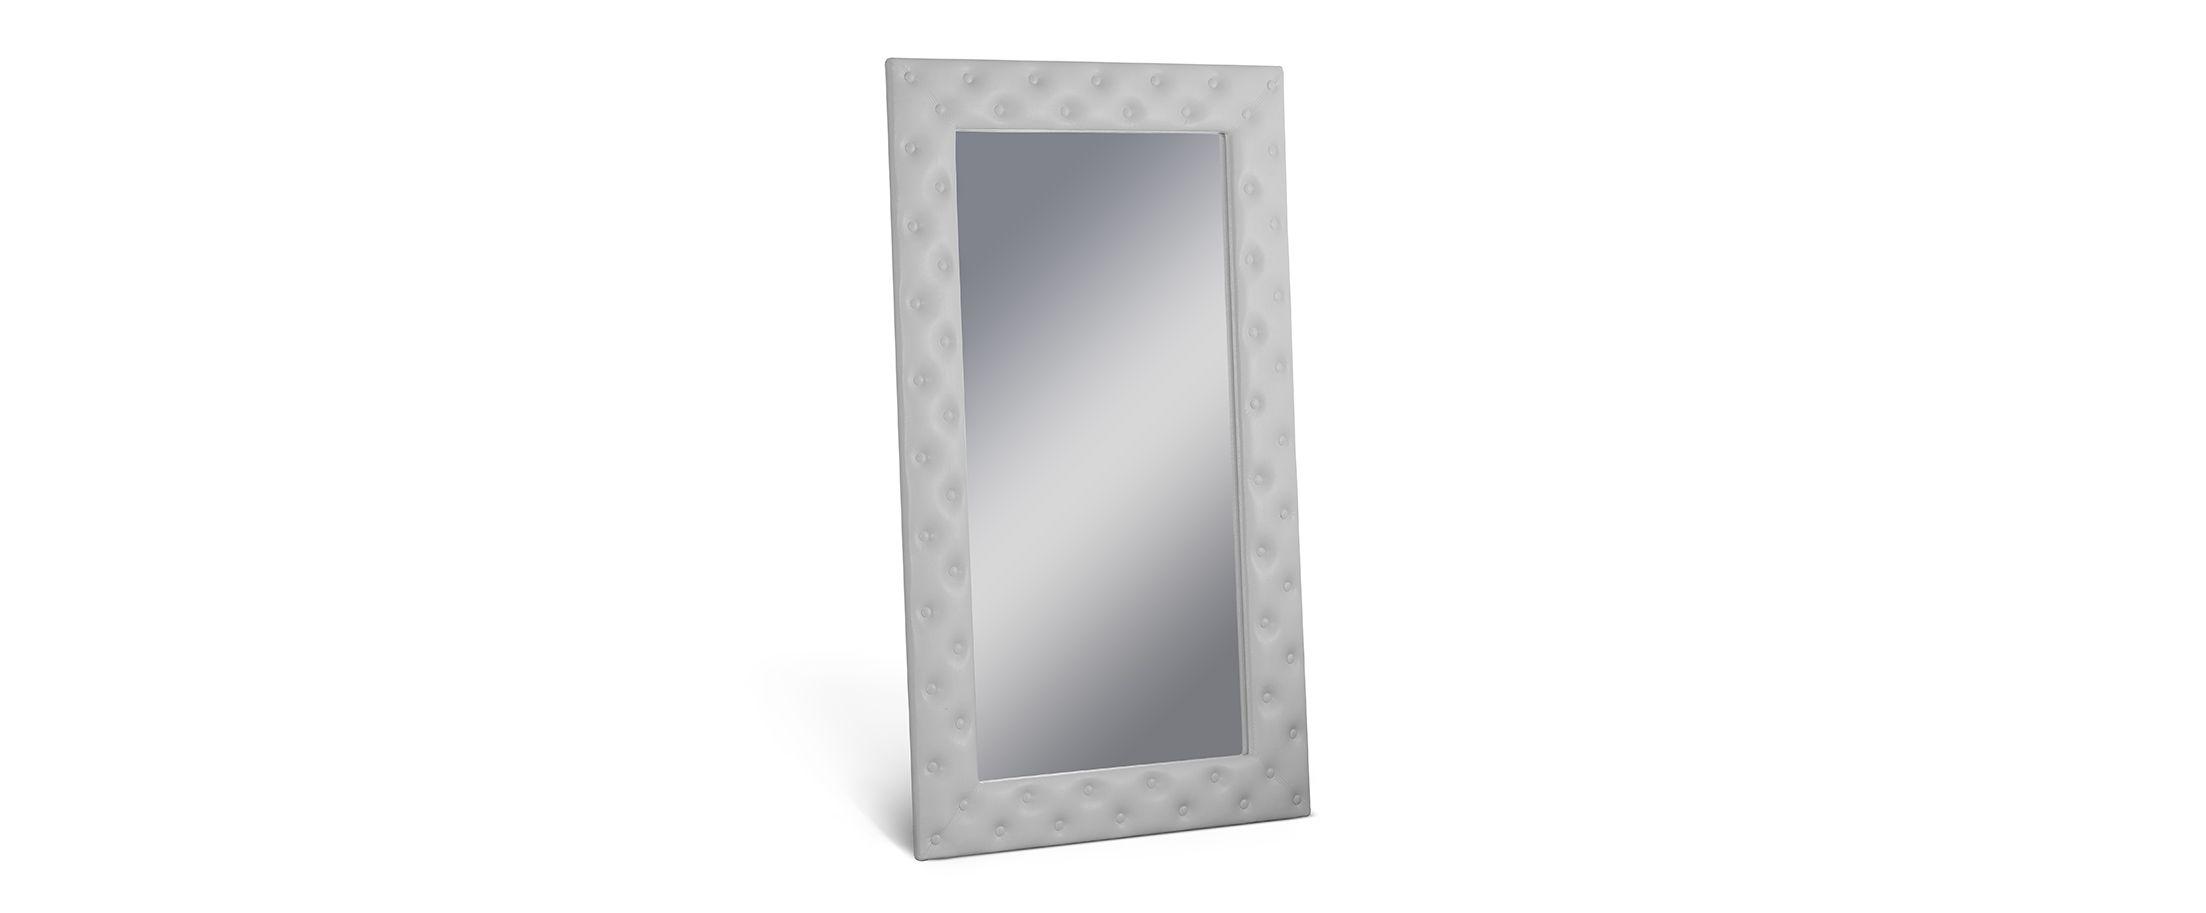 Зеркало Кааба большое с пуговицами молоко от MOON TRADE